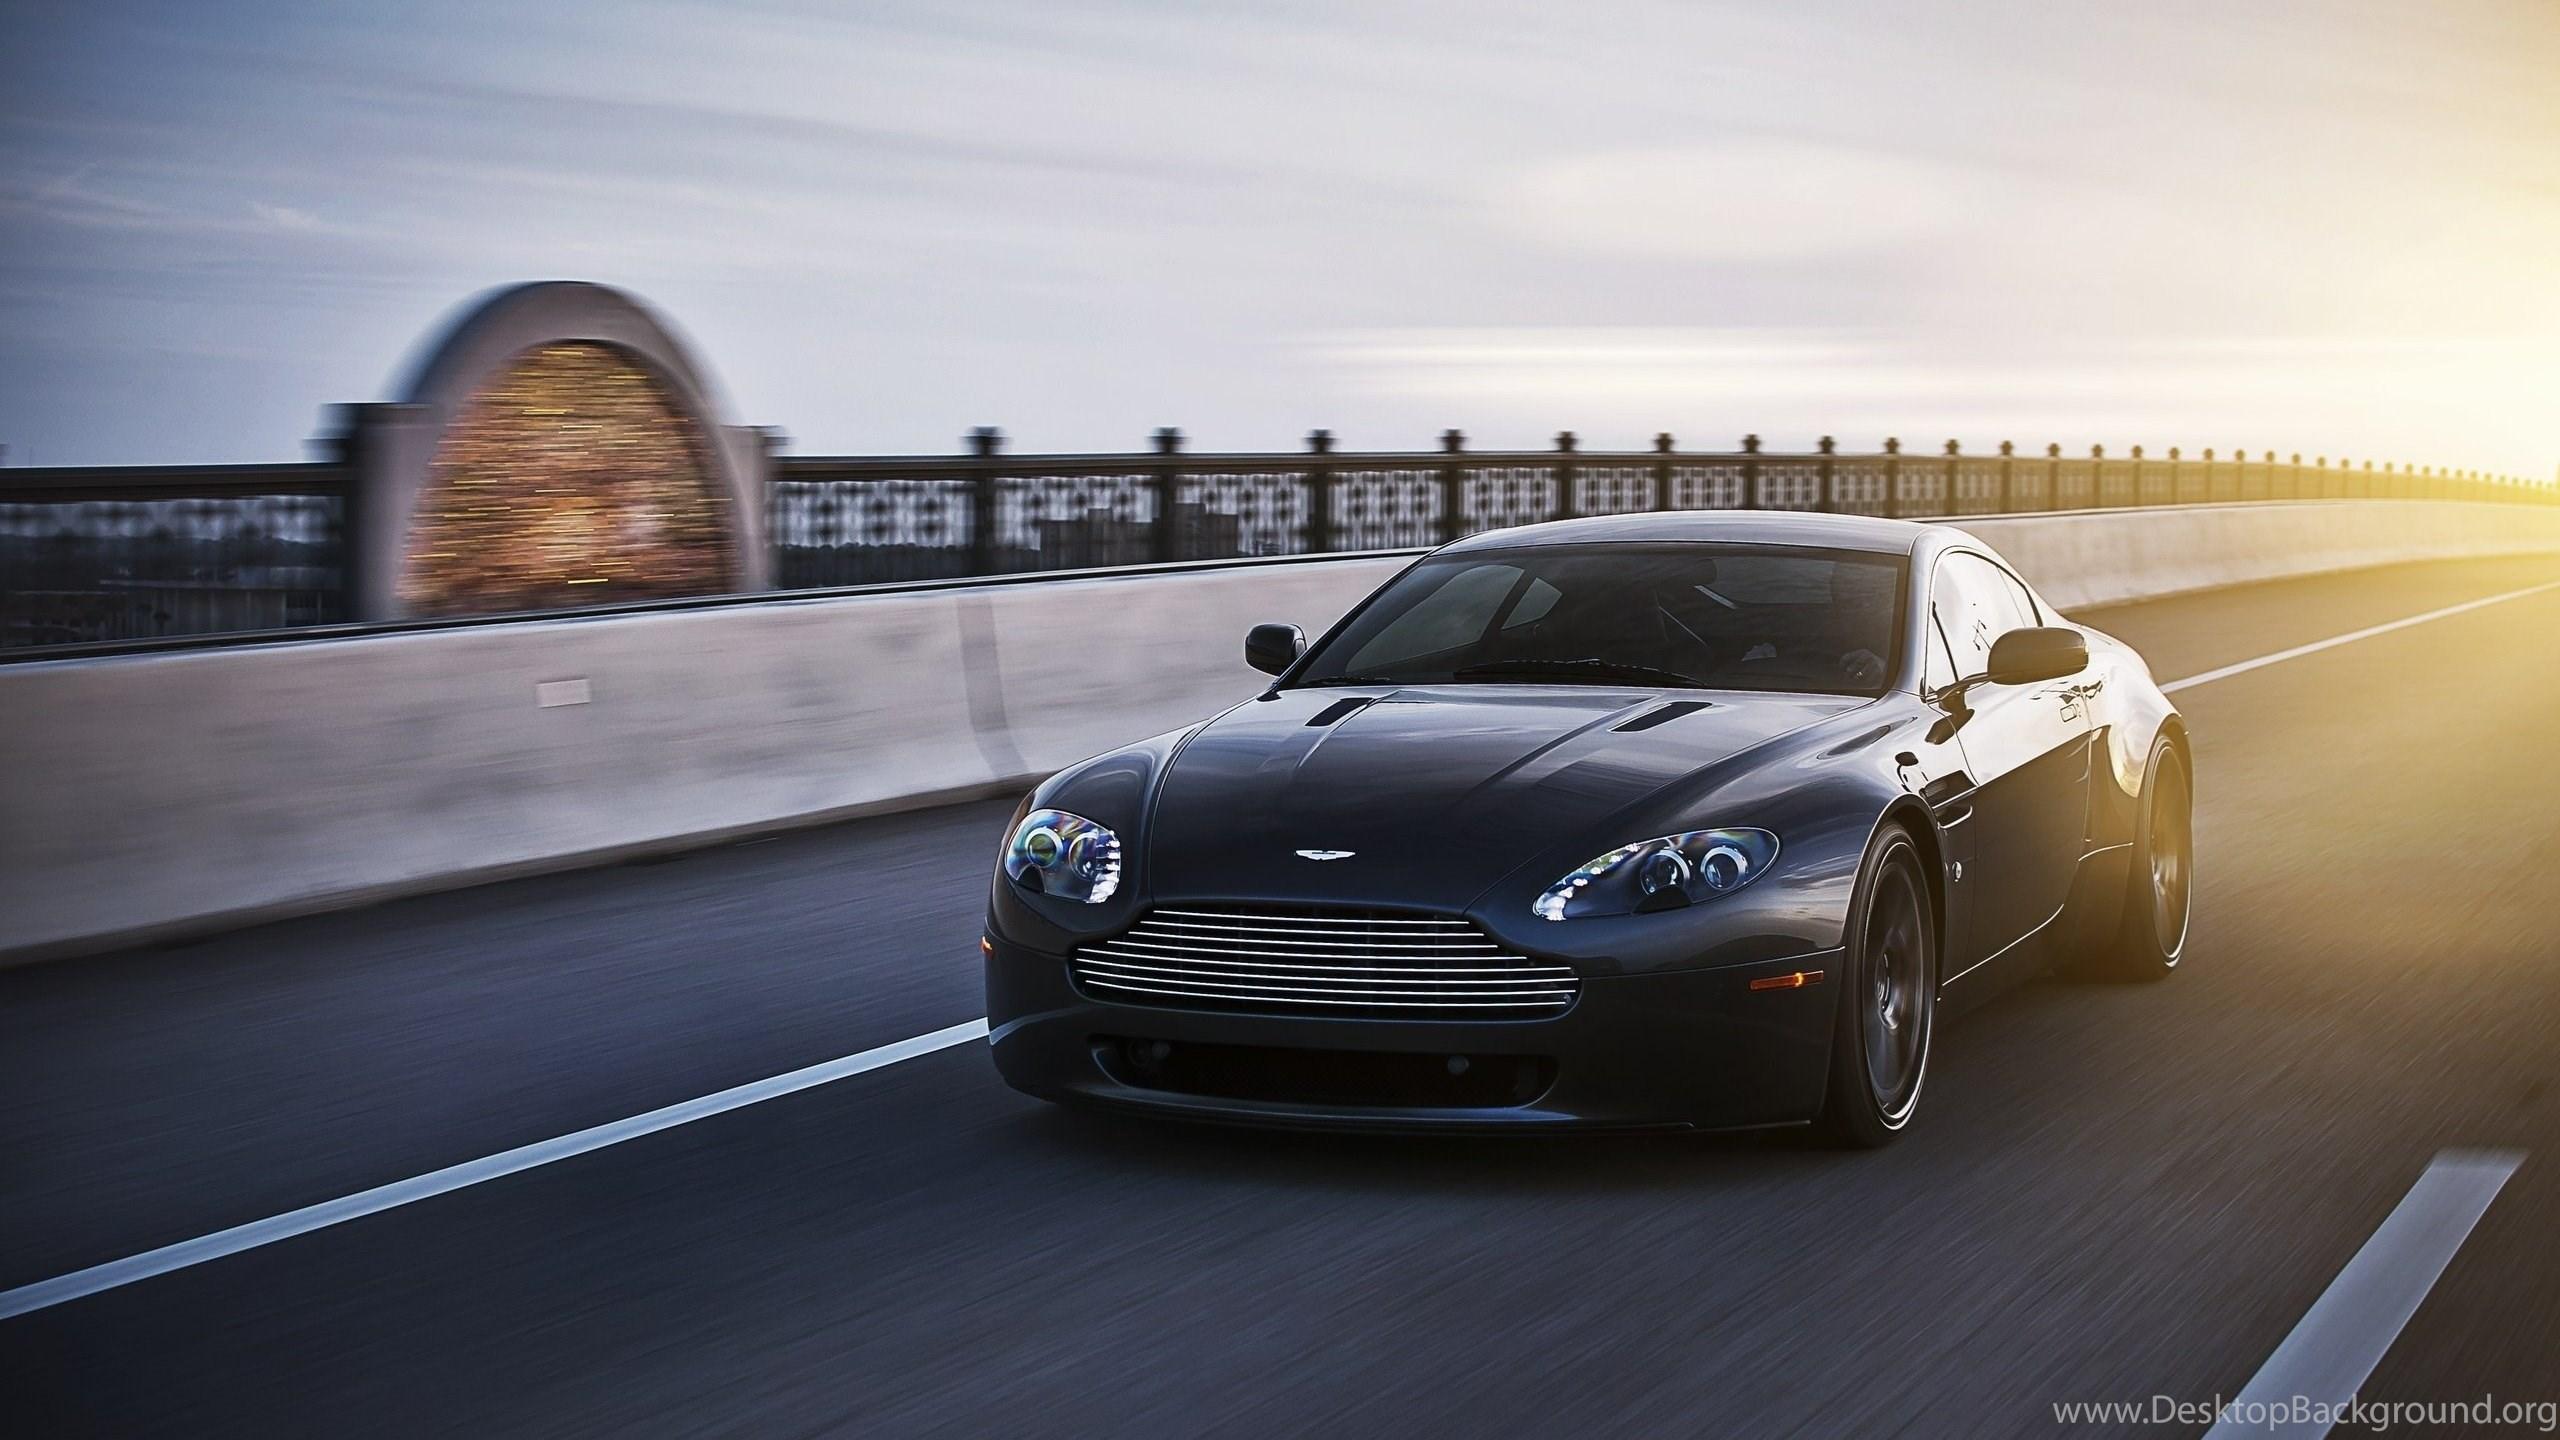 Black Aston Martin Dbs Wallpapers Desktop Background